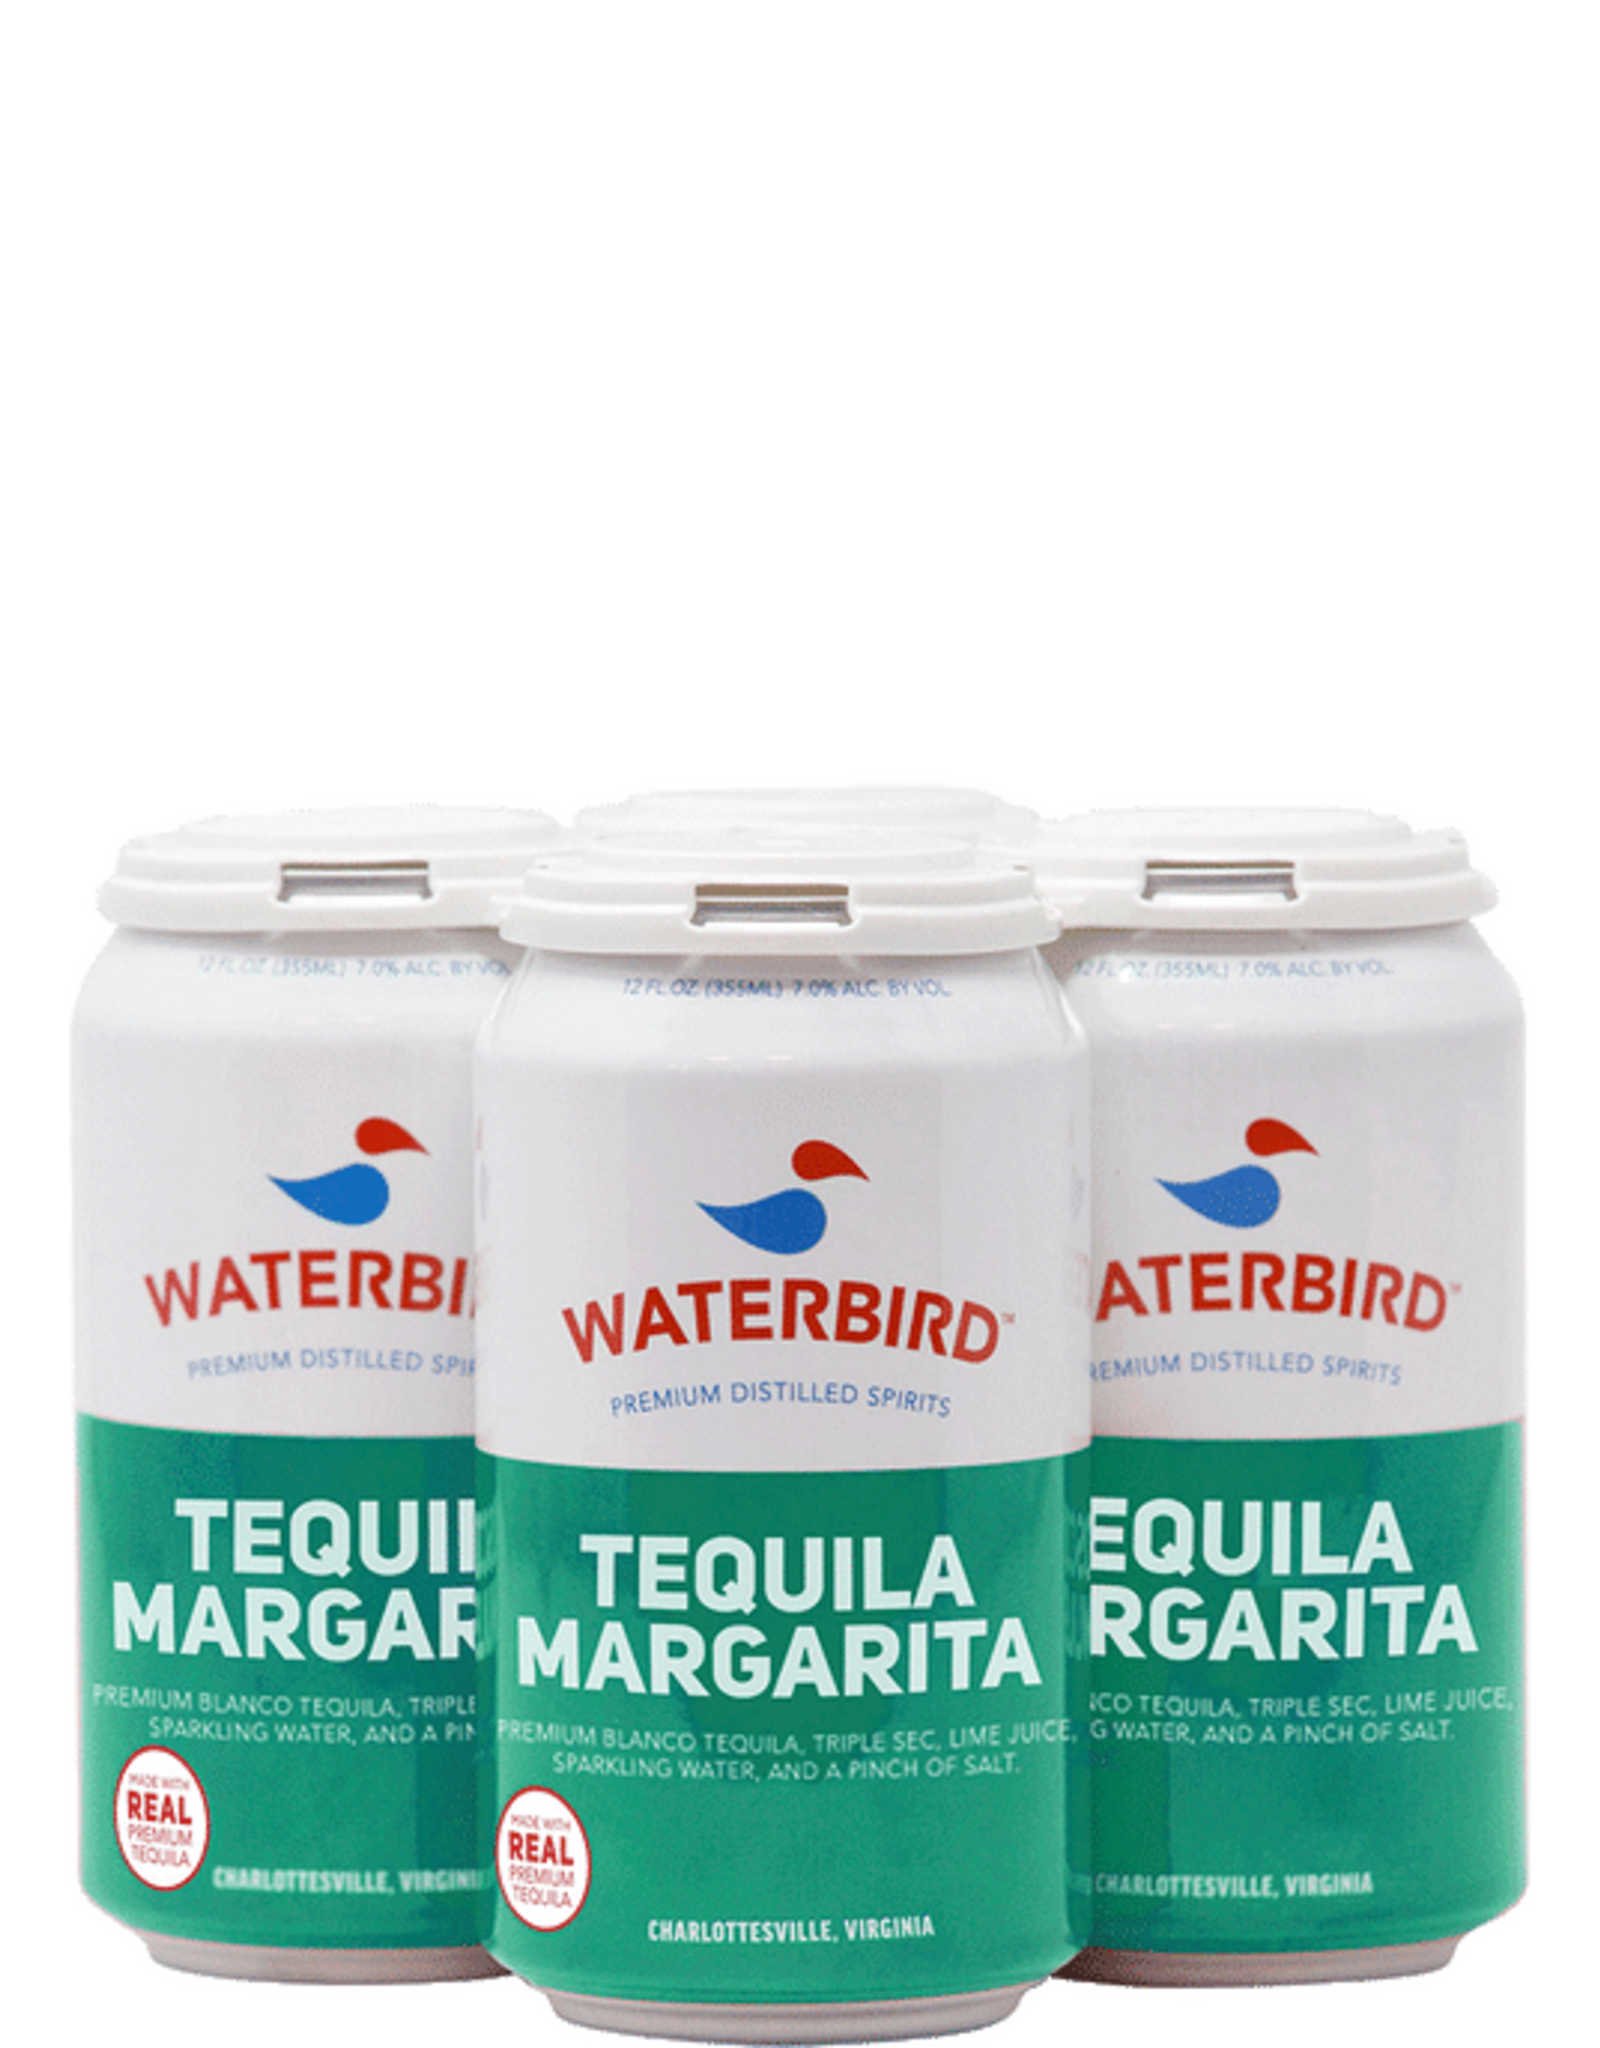 Waterbird Waterbird Tequila Margarita